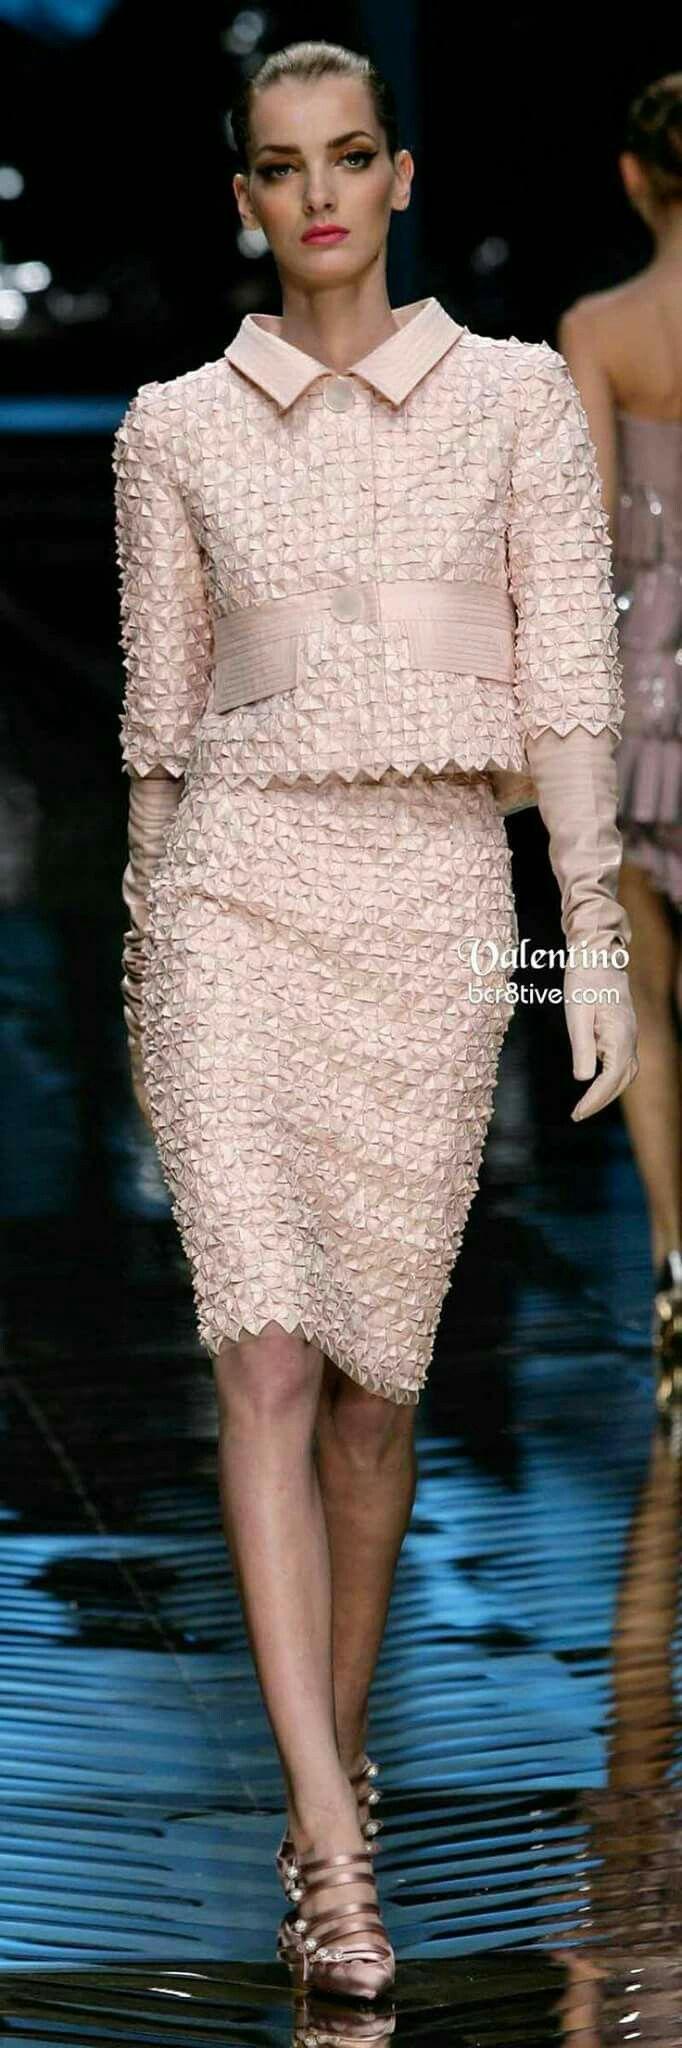 Tailleur valentino haute couture pinterest clothes for Haute couture suits